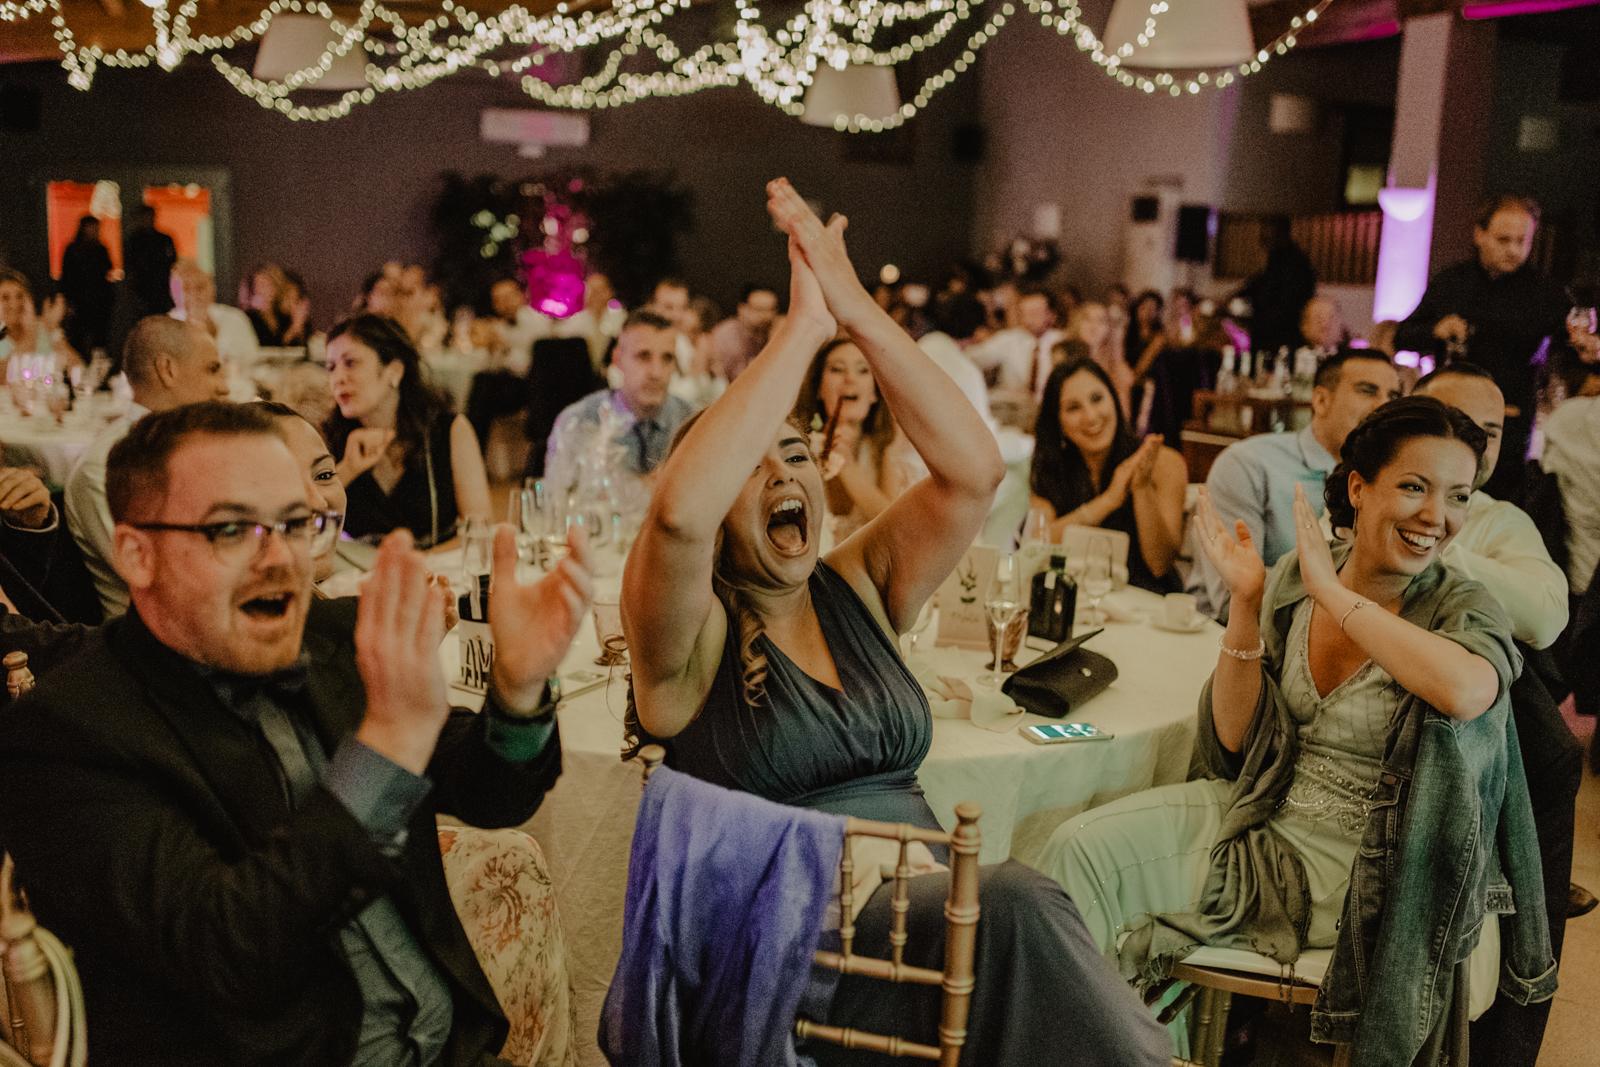 thenortherngirlphotography_photography_thenortherngirl_rebeccascabros_wedding_weddingphotography_weddingphotographer_barcelona_bodaenbarcelona_bodaenmaselmarti_bodarogeryvane-951.jpg